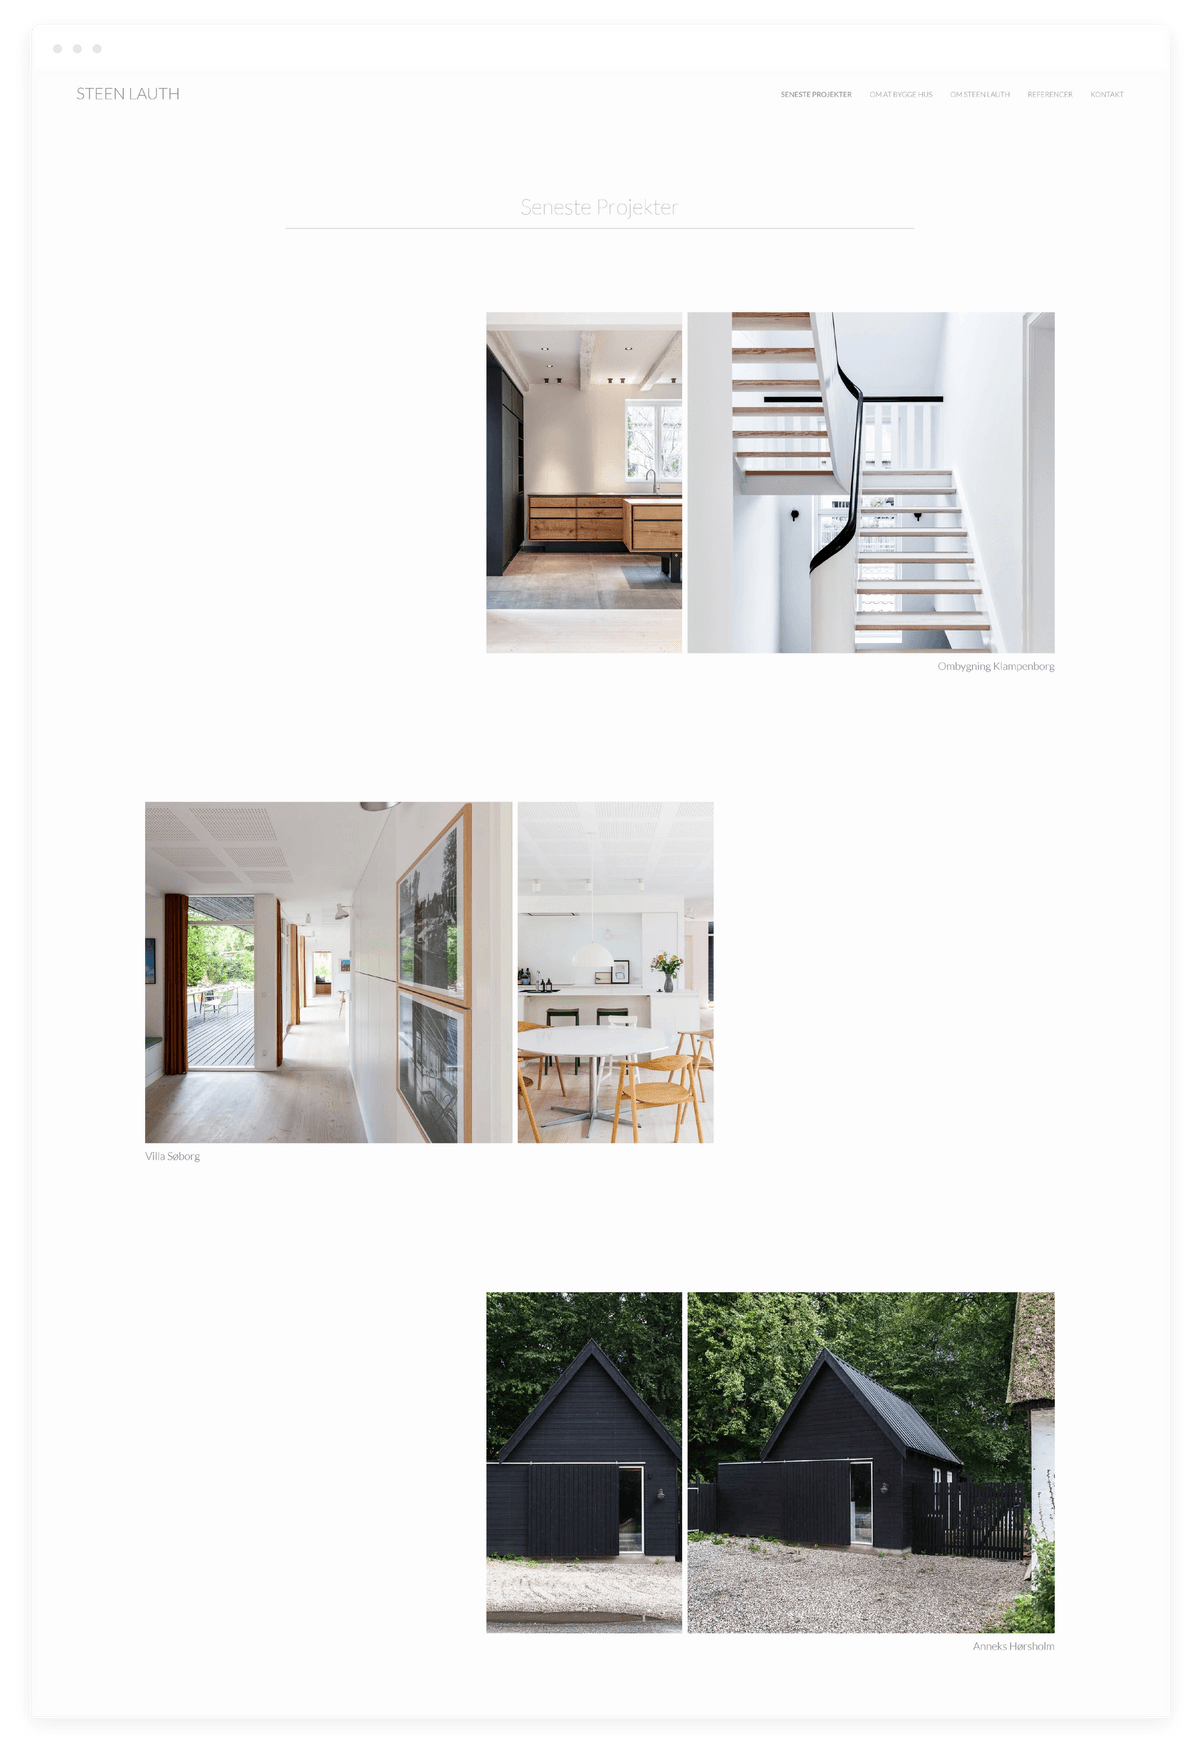 Steen Lauth seneste projekter